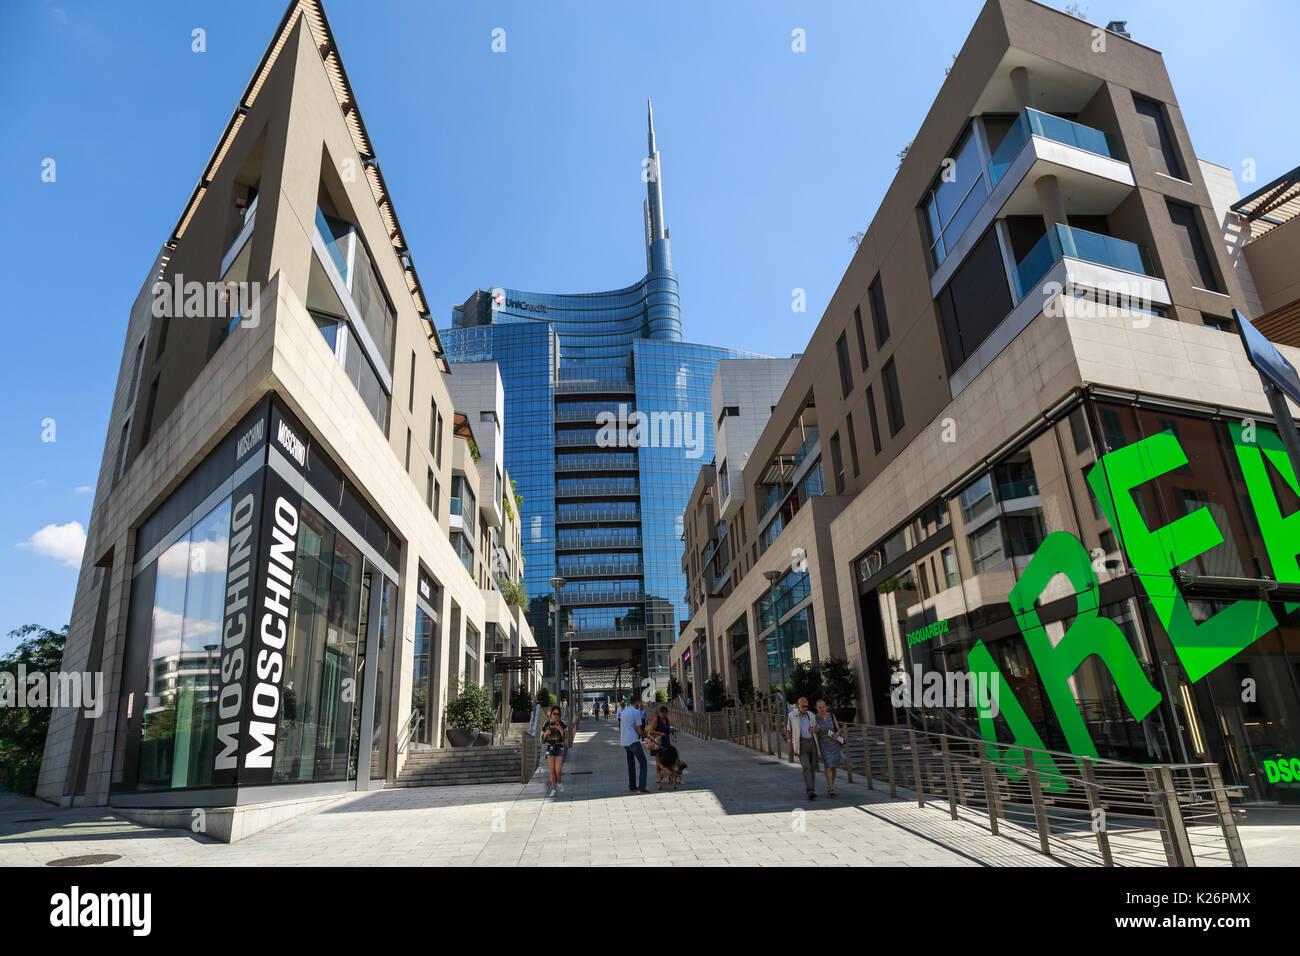 Architectures in Porta Nuova district, Milano,Italy - Stock Image